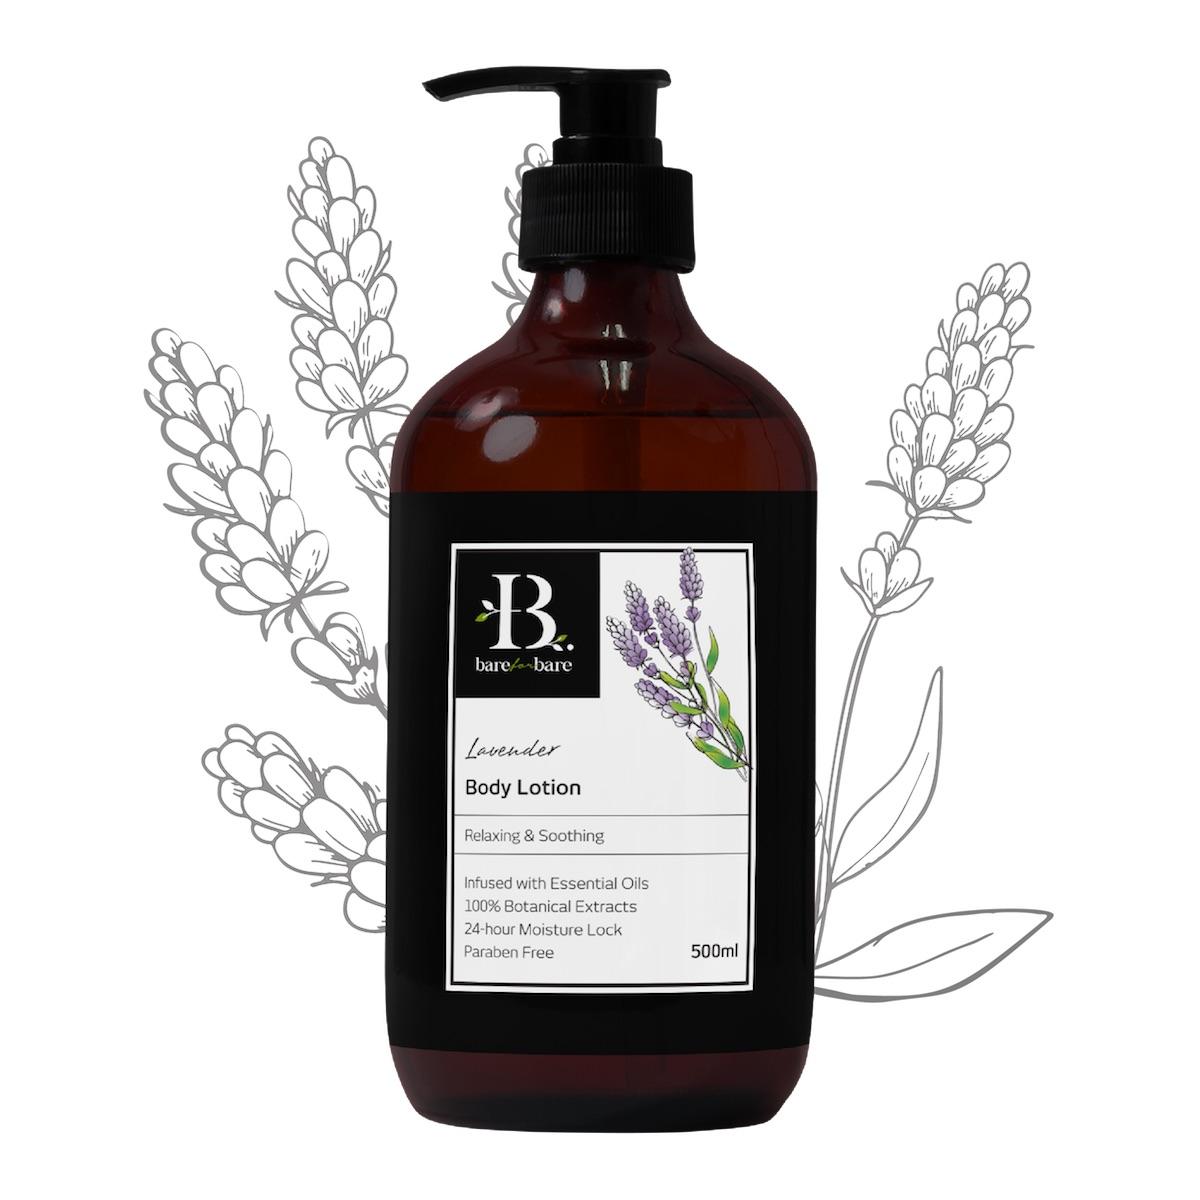 [MPLUS] BARE FOR BARE Body Lotion Lavender 500ml